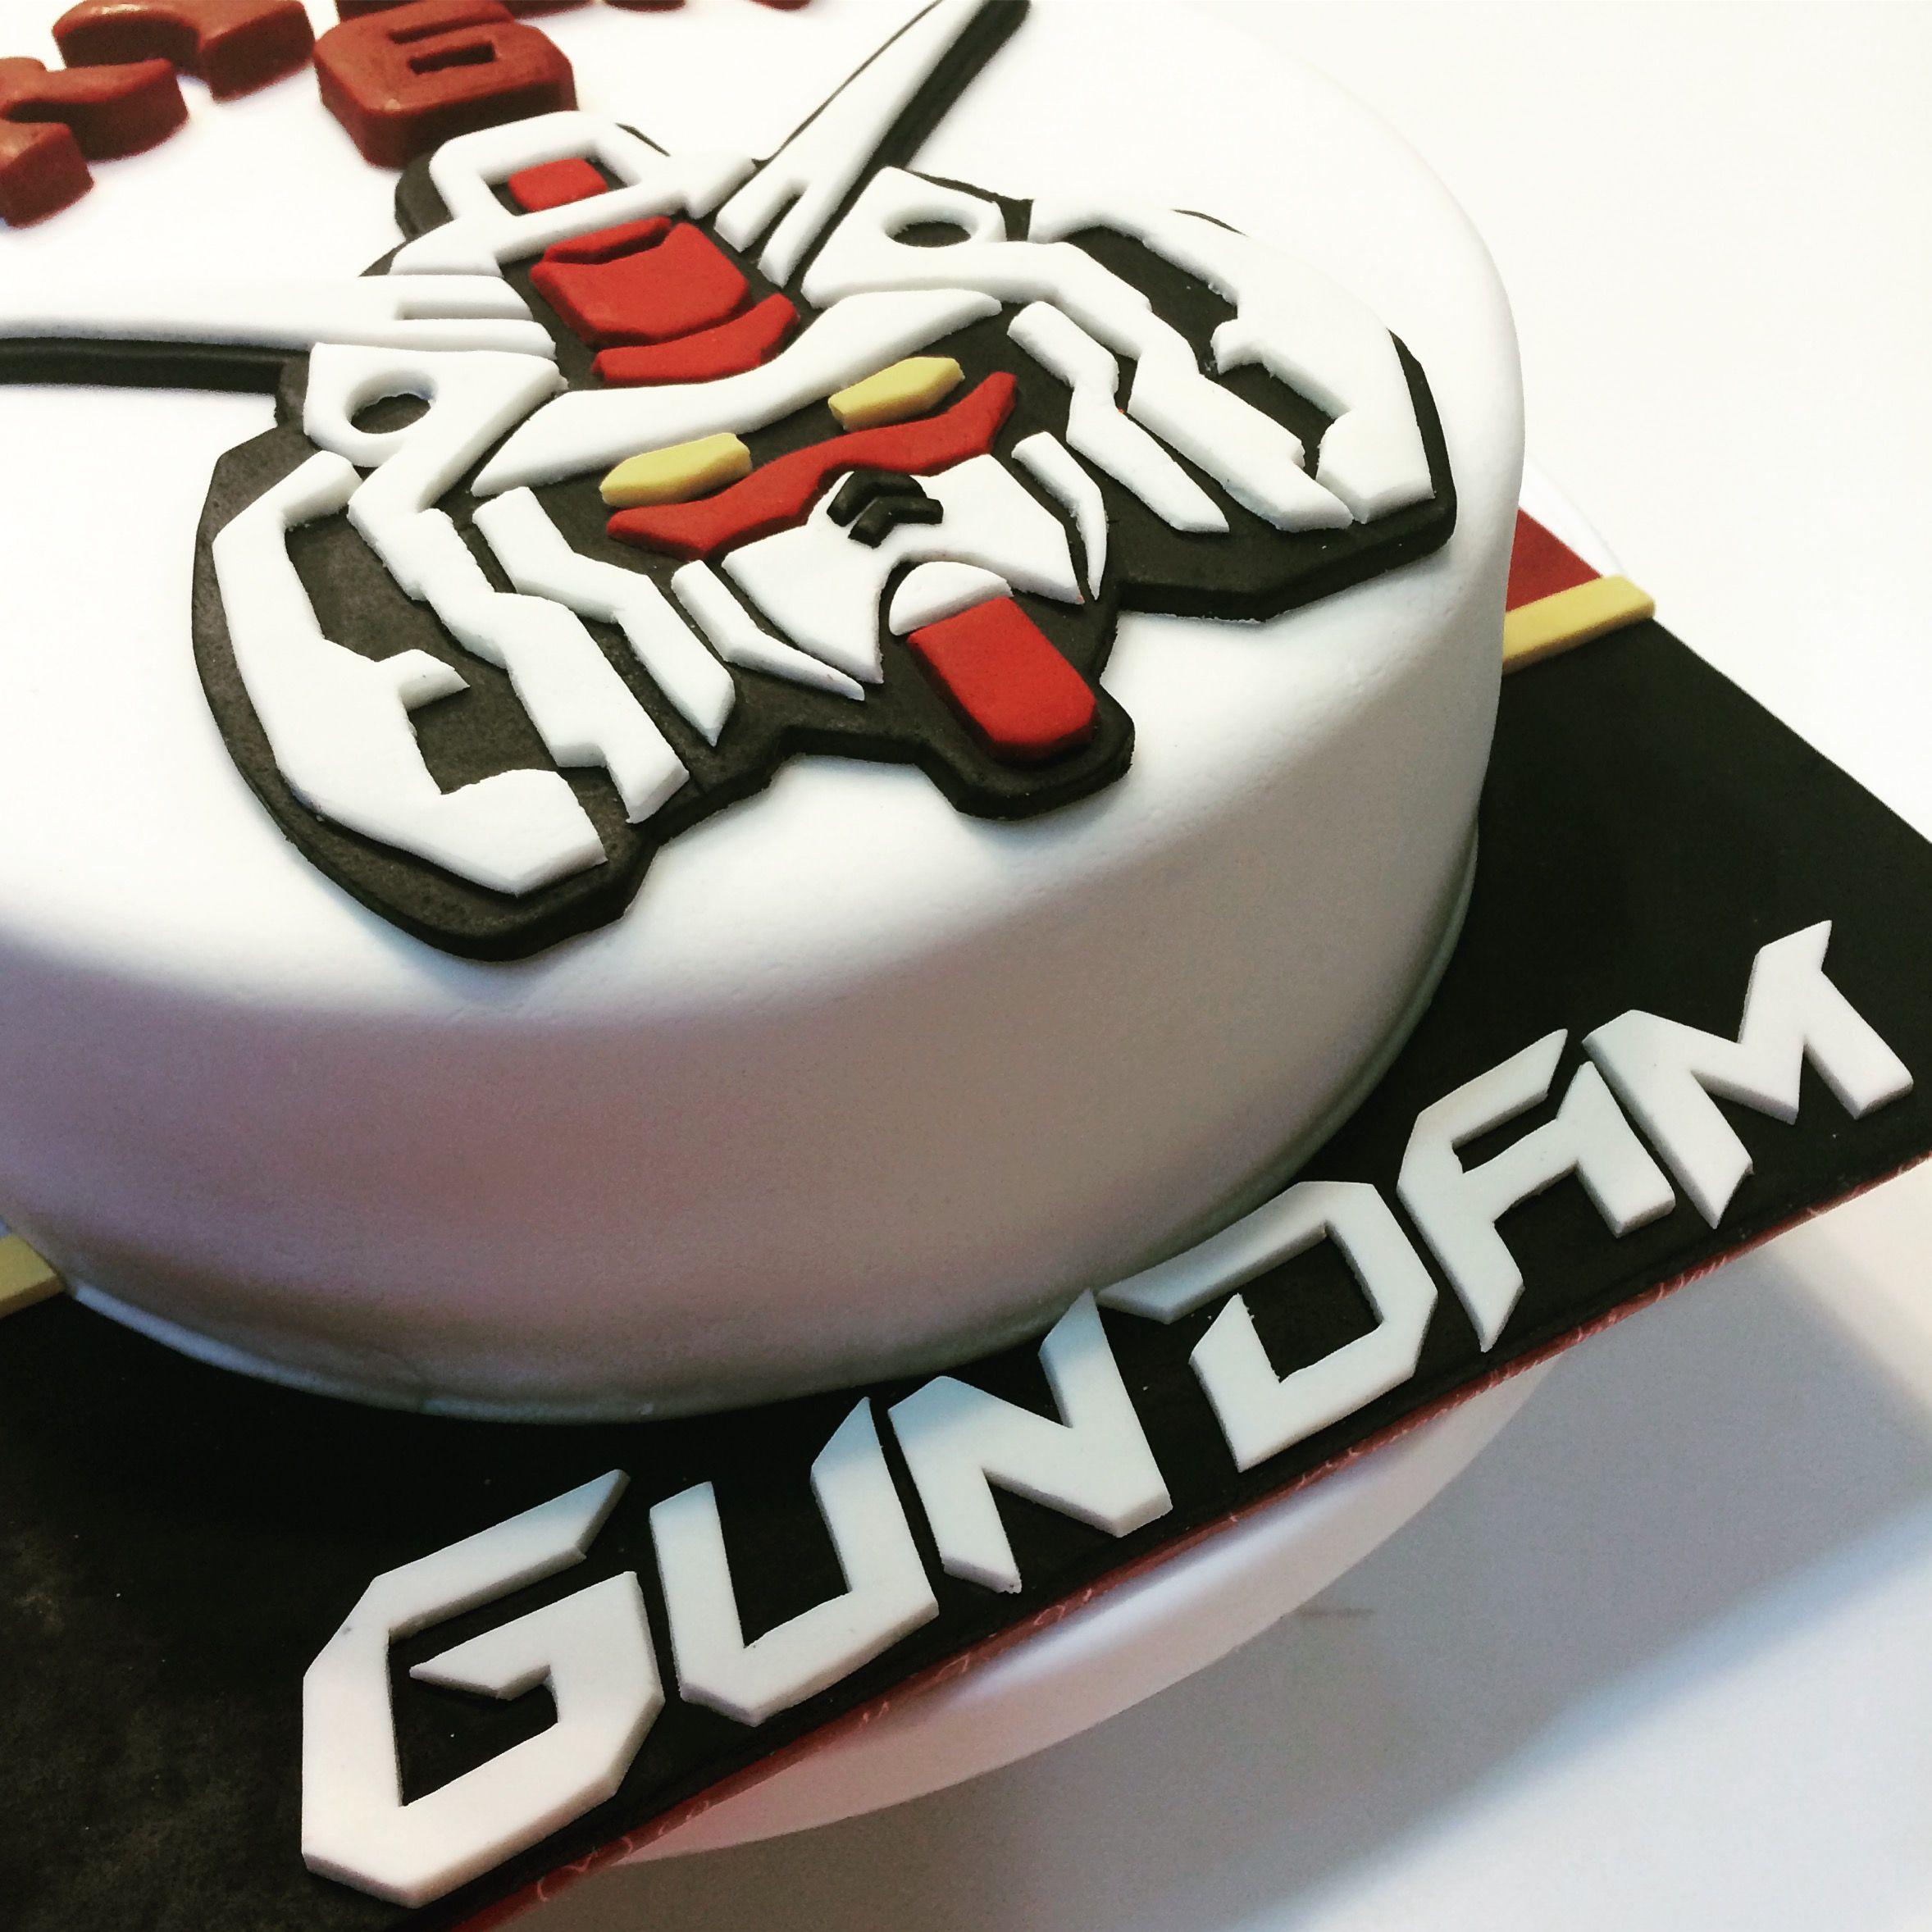 Gundam Themed Birthday Cakes Pinterest Themed Birthday Cakes